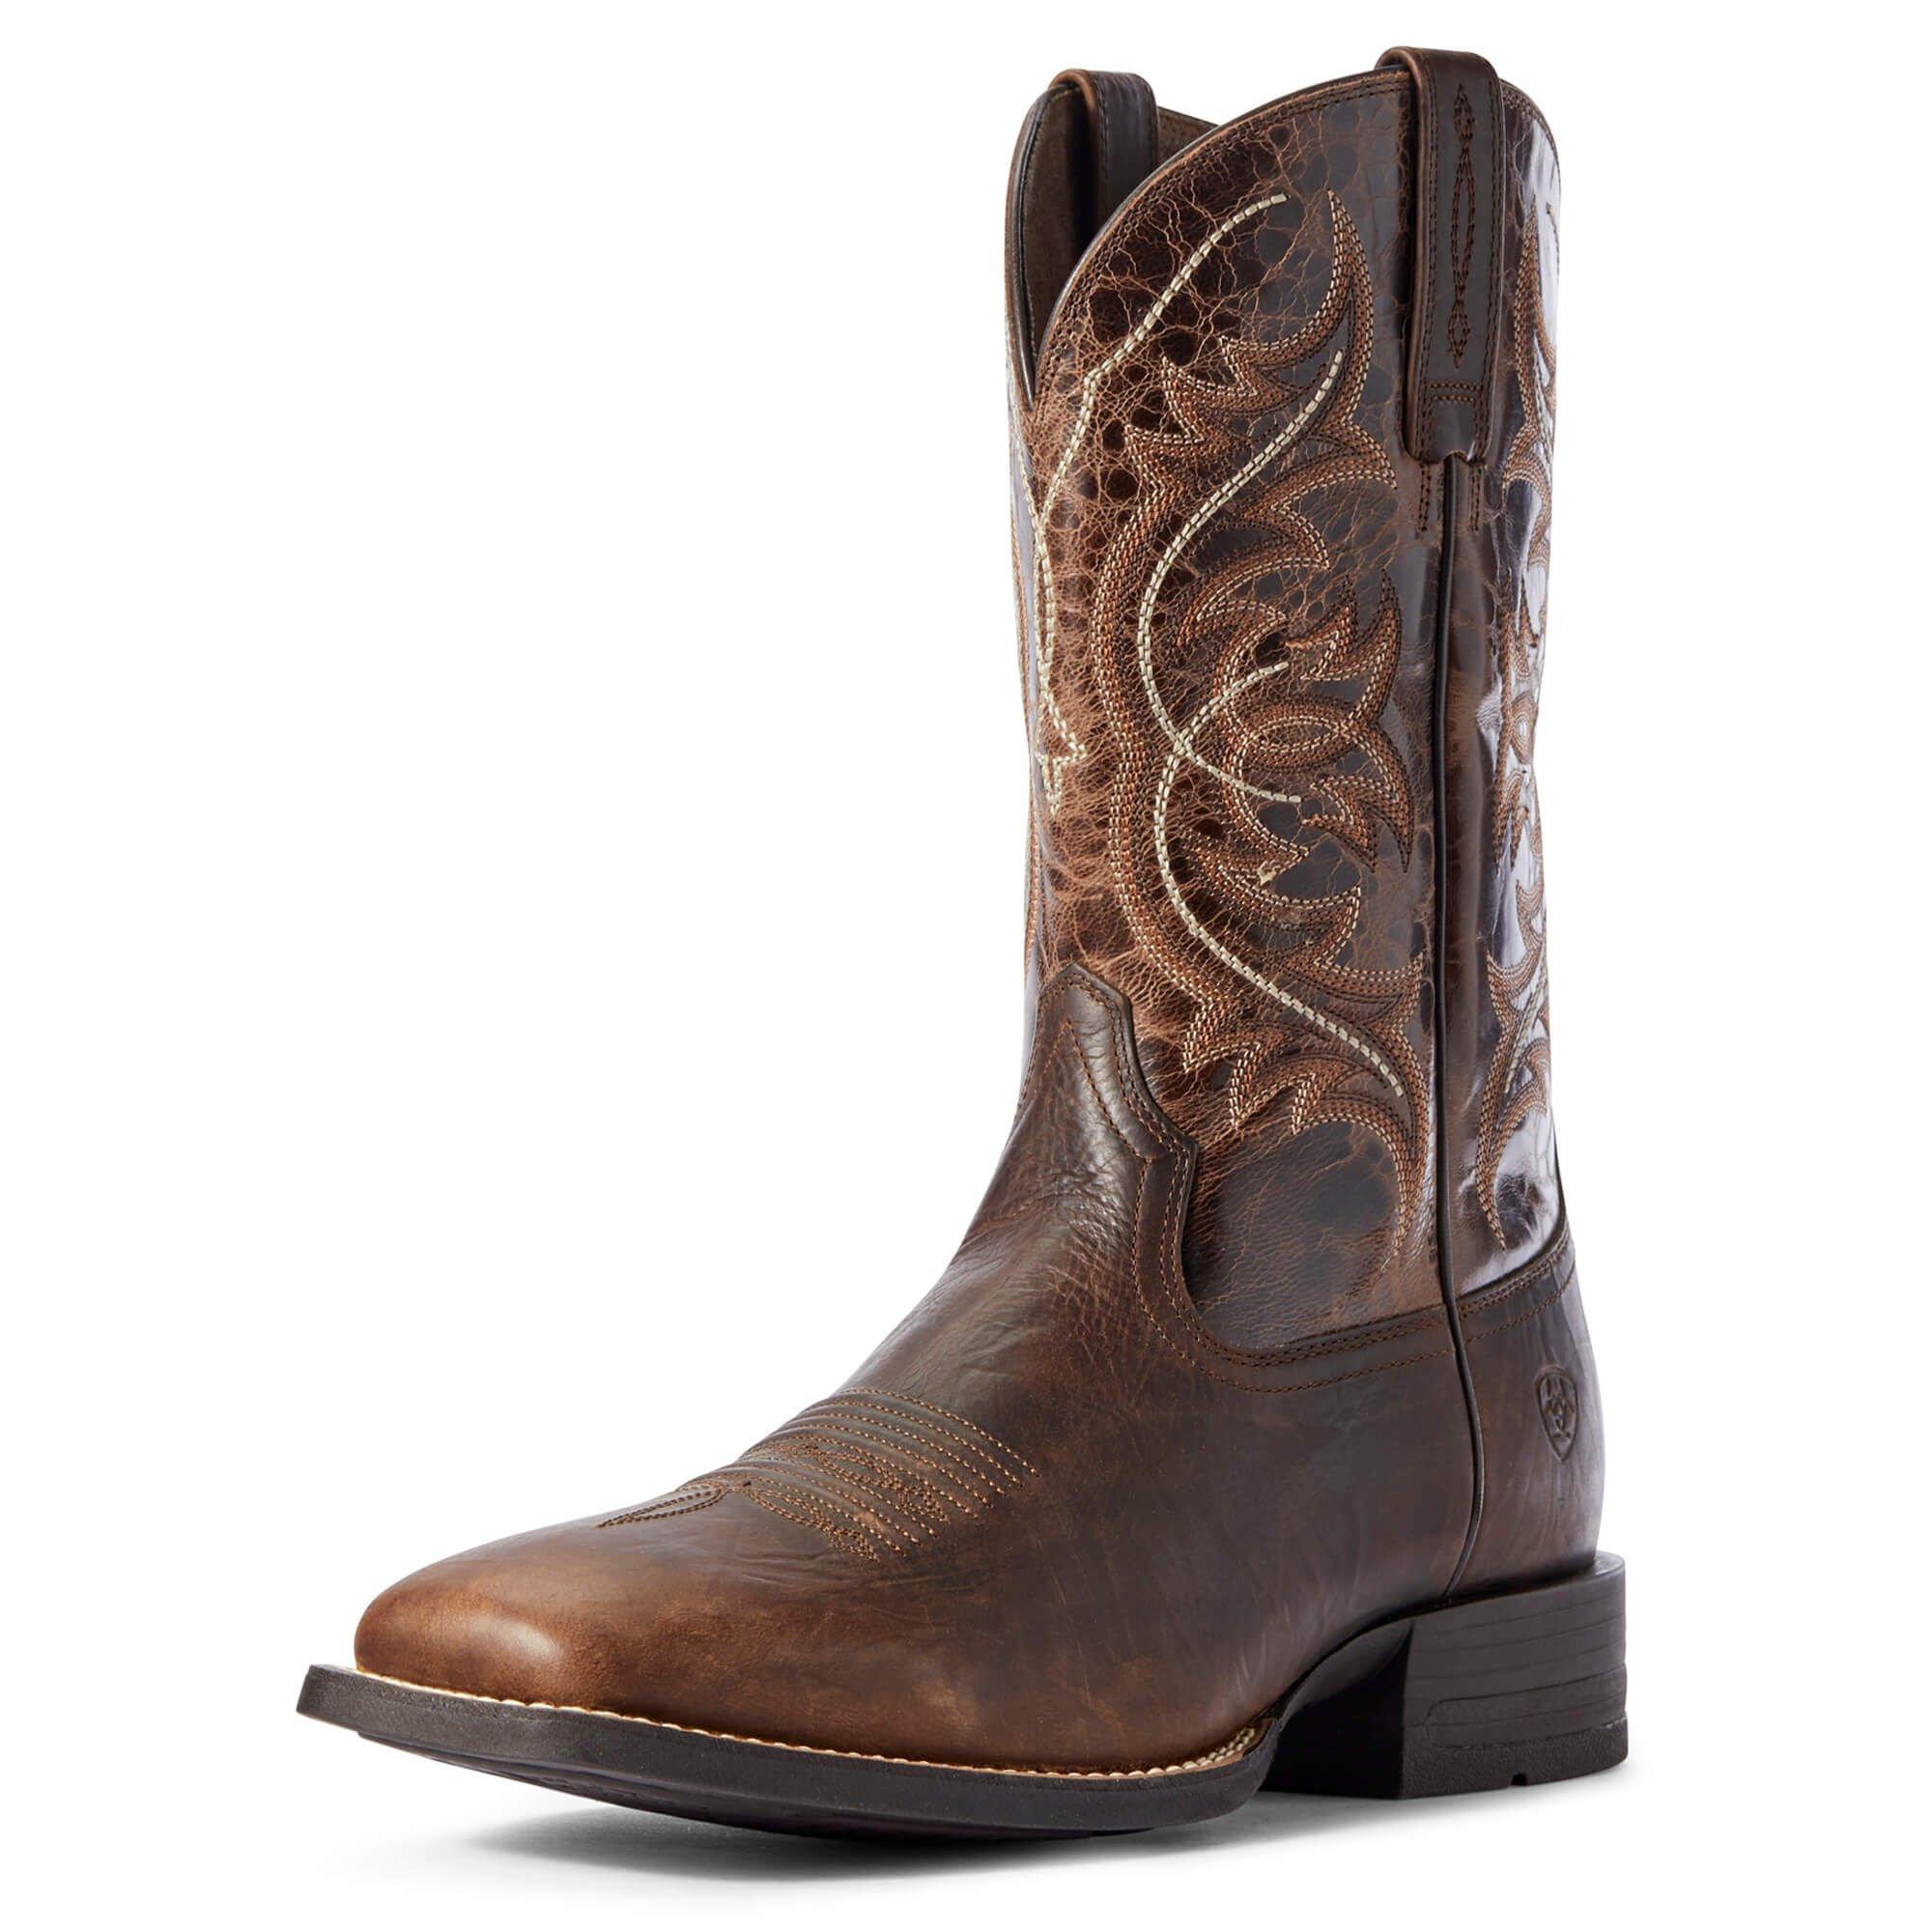 Holder Western Boot